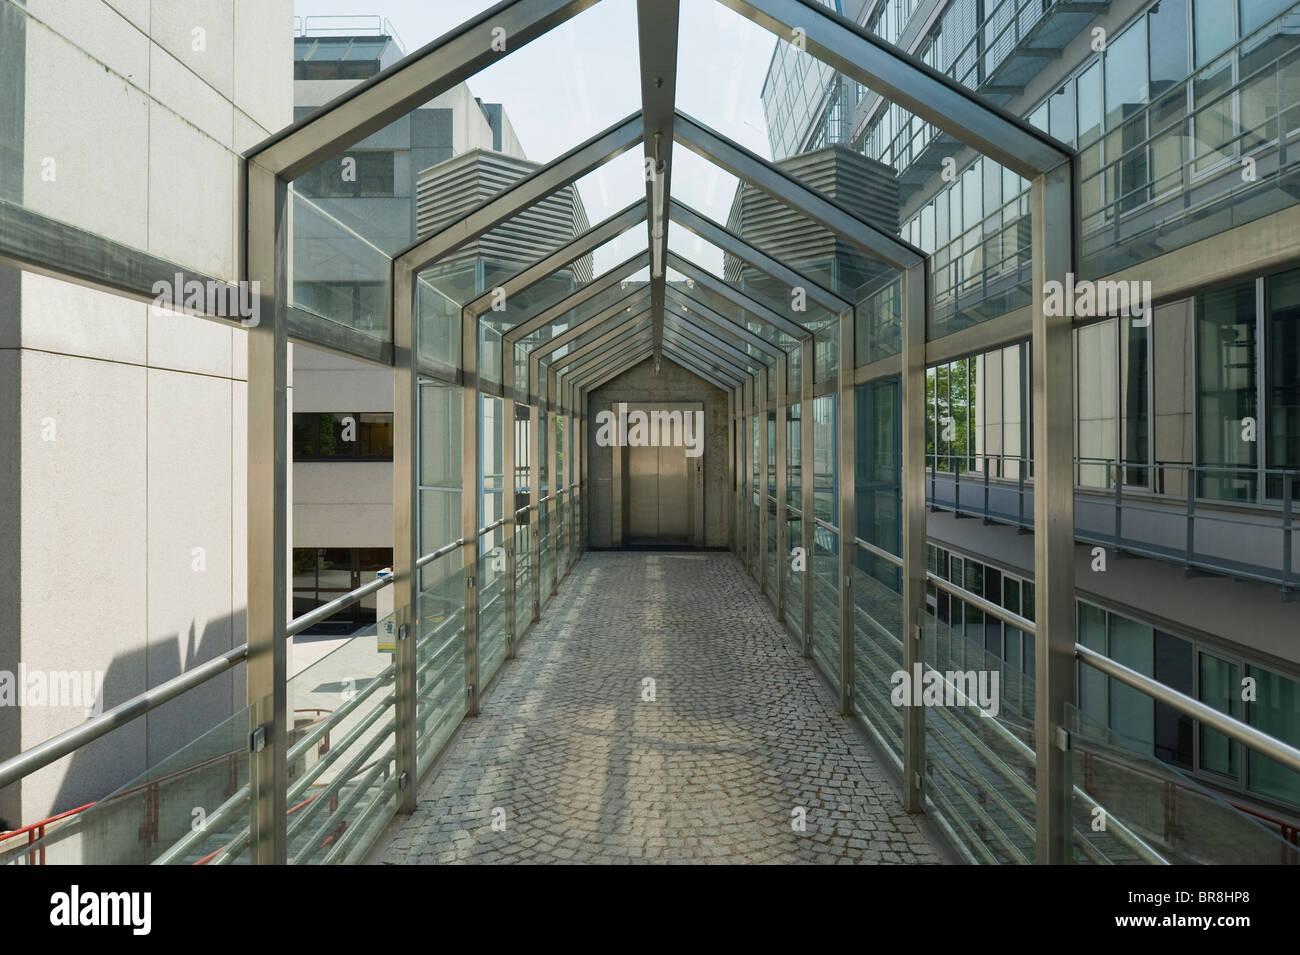 Aufzug - Lift Stockbild